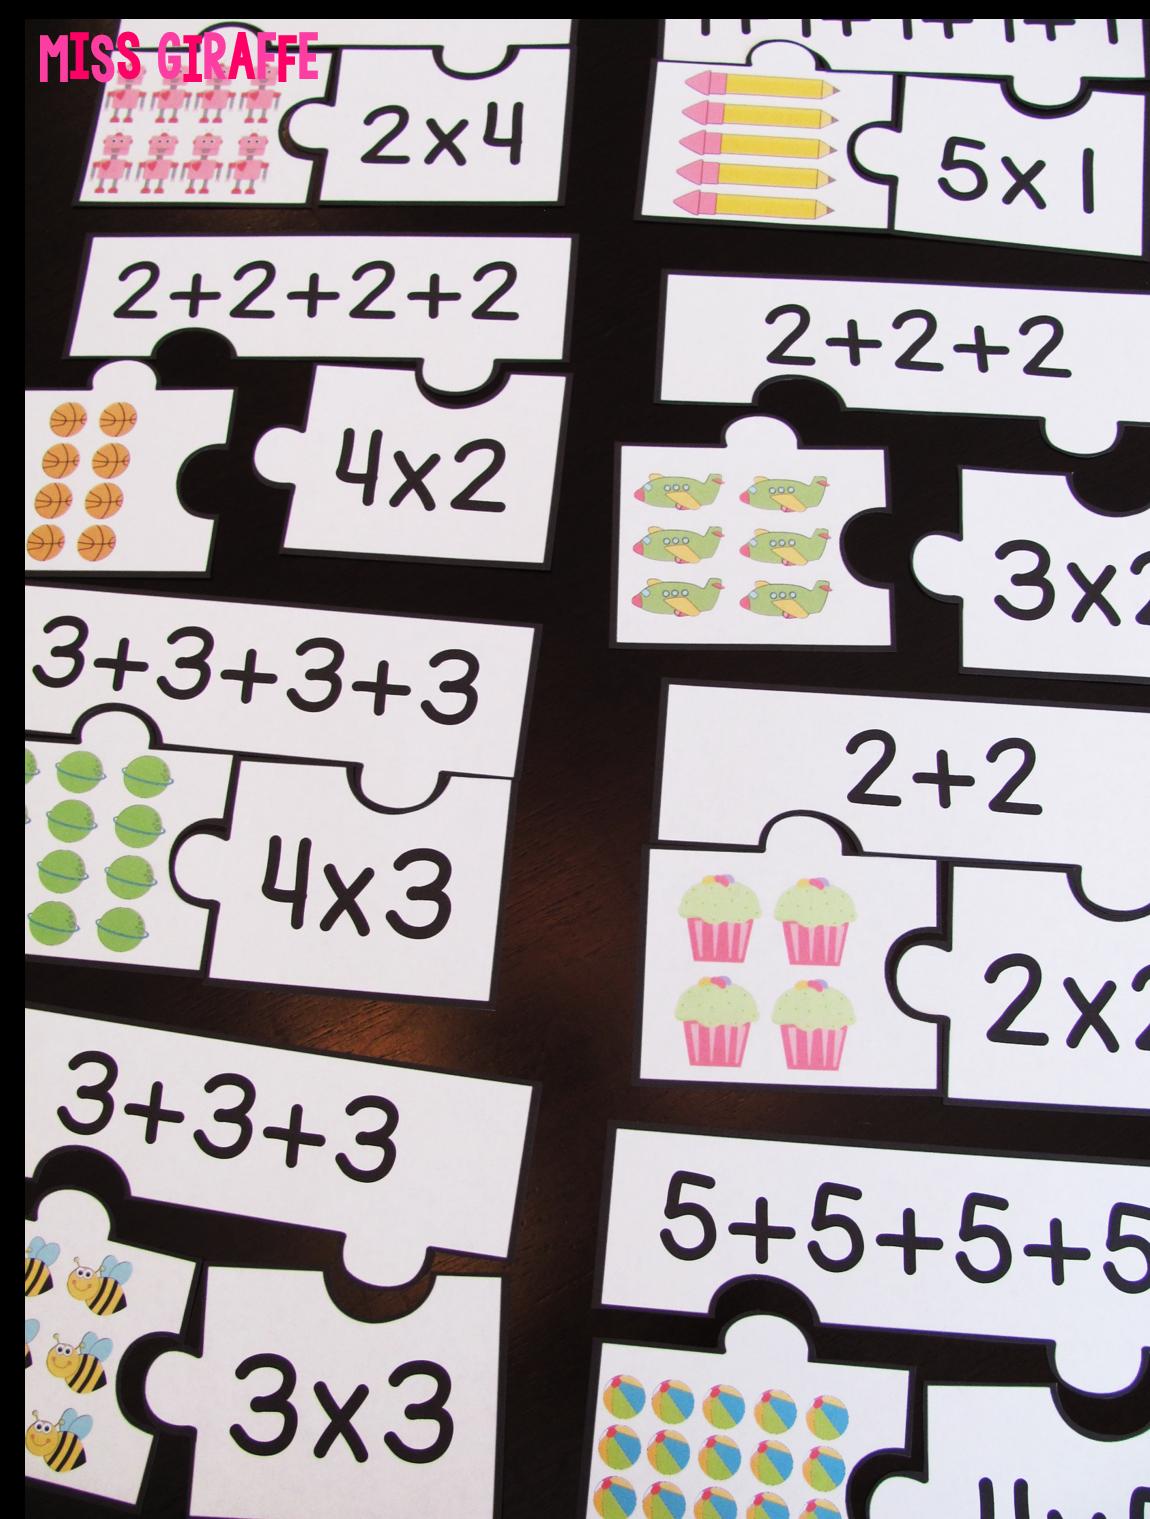 small resolution of Miss Giraffe's Class: How to Teach Arrays